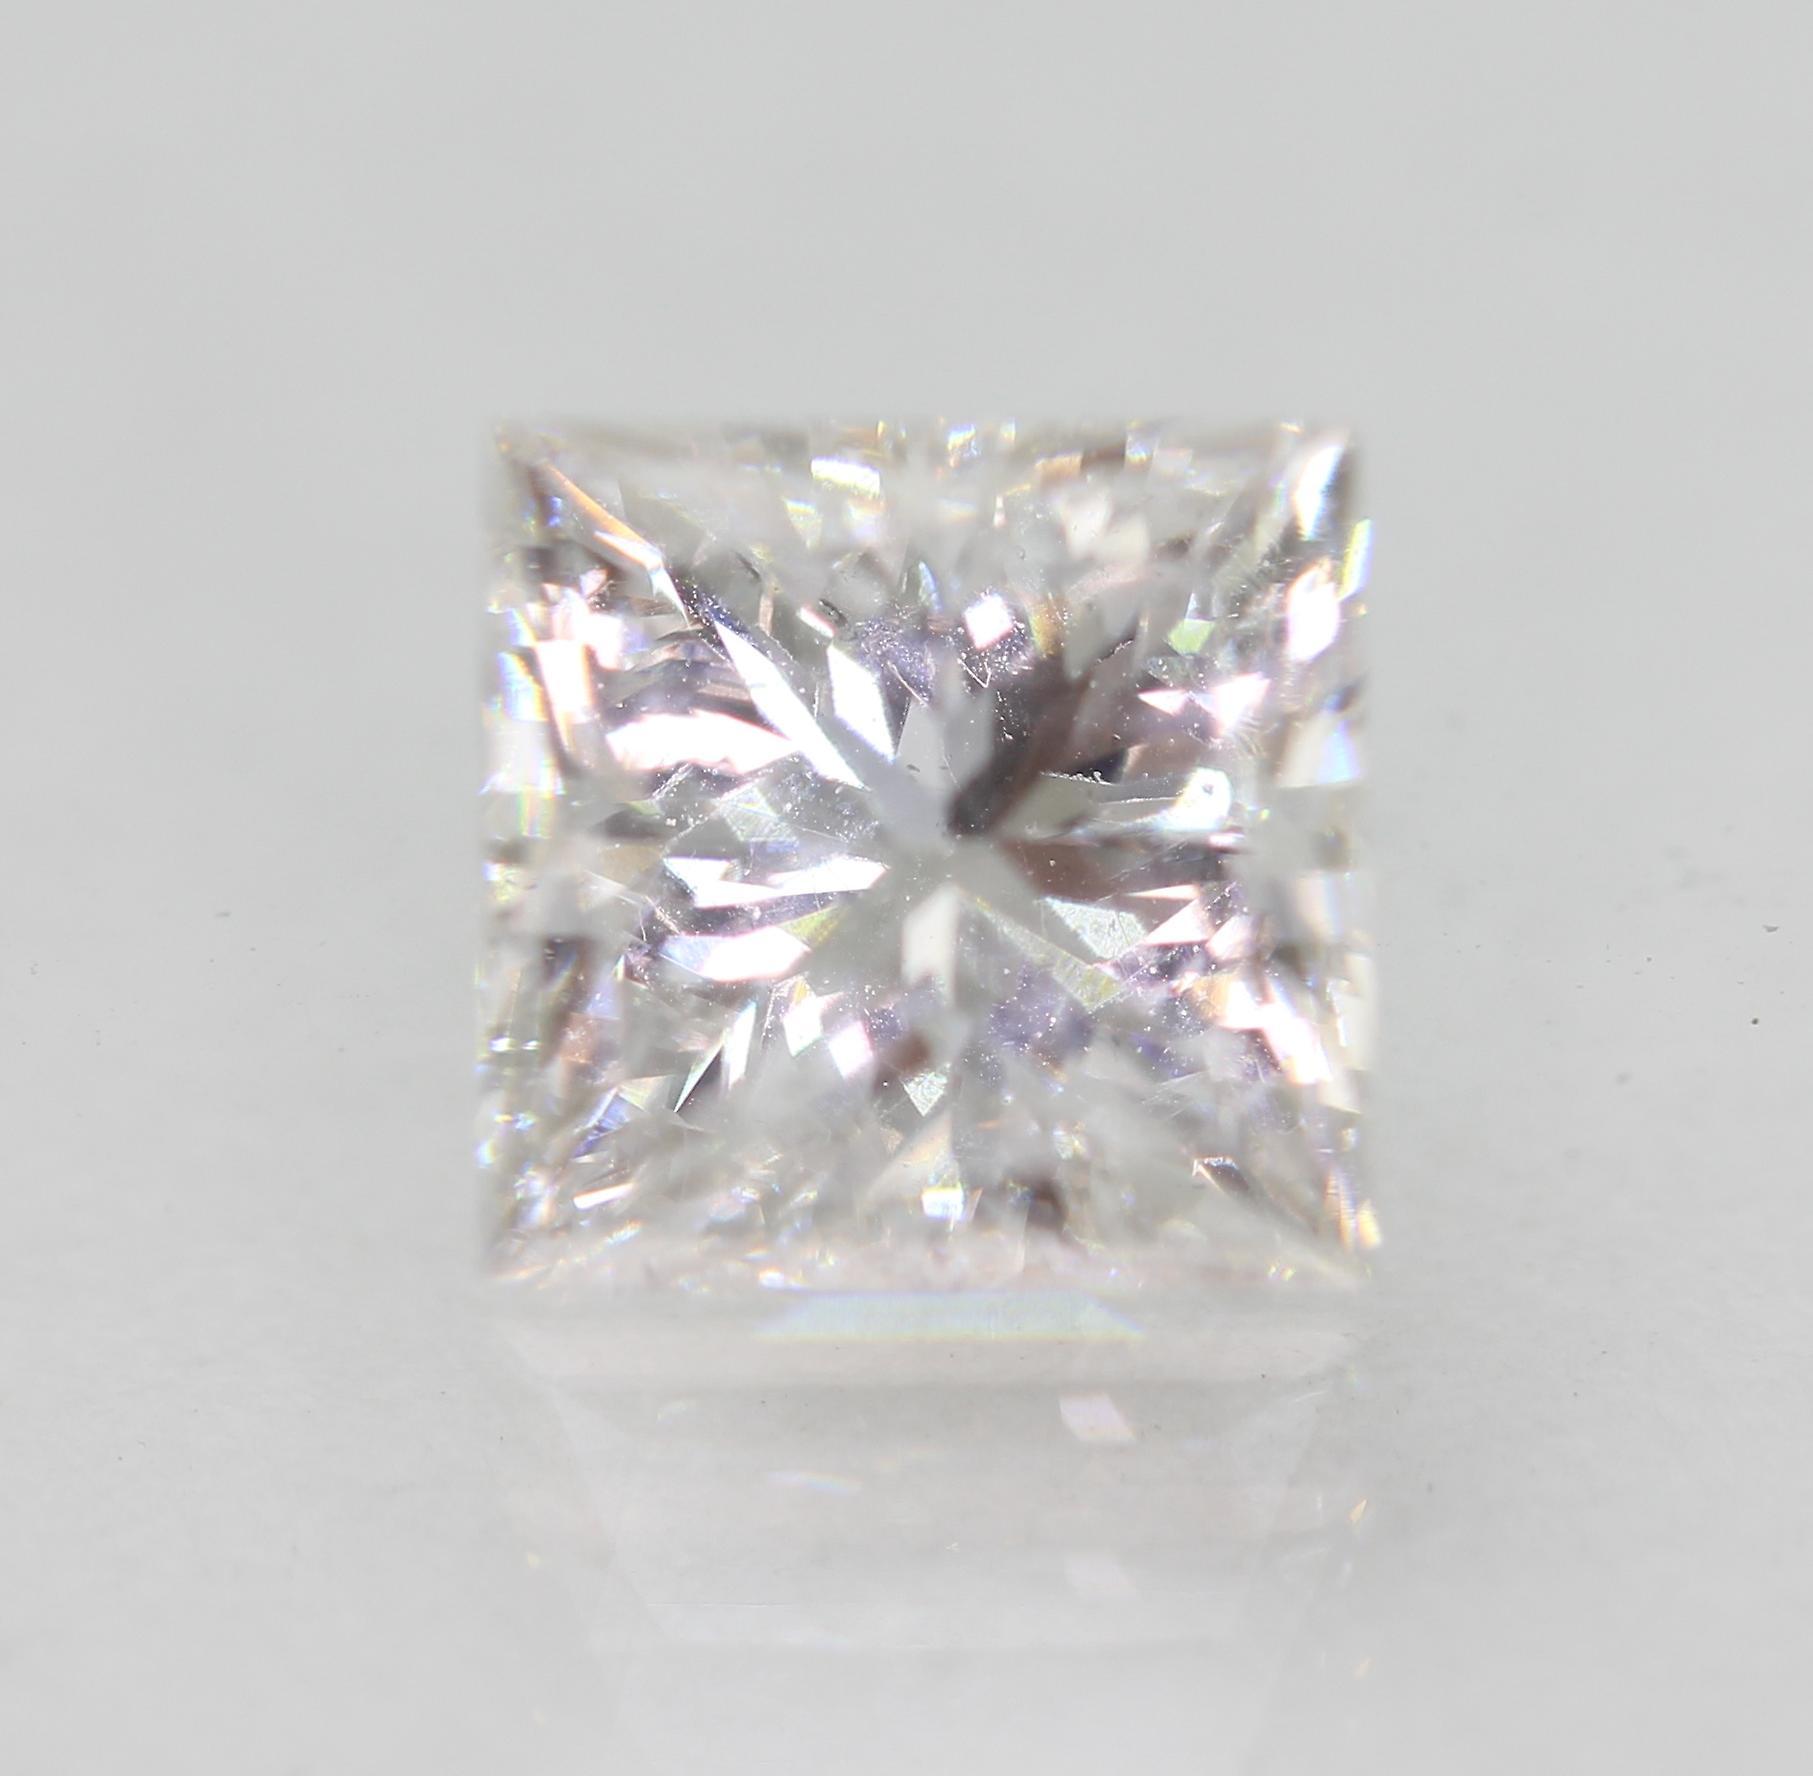 Certified 1.09 Carat D VVS2 Princess Enhanced Natural Diamond 5.66x5.53mm 2VG